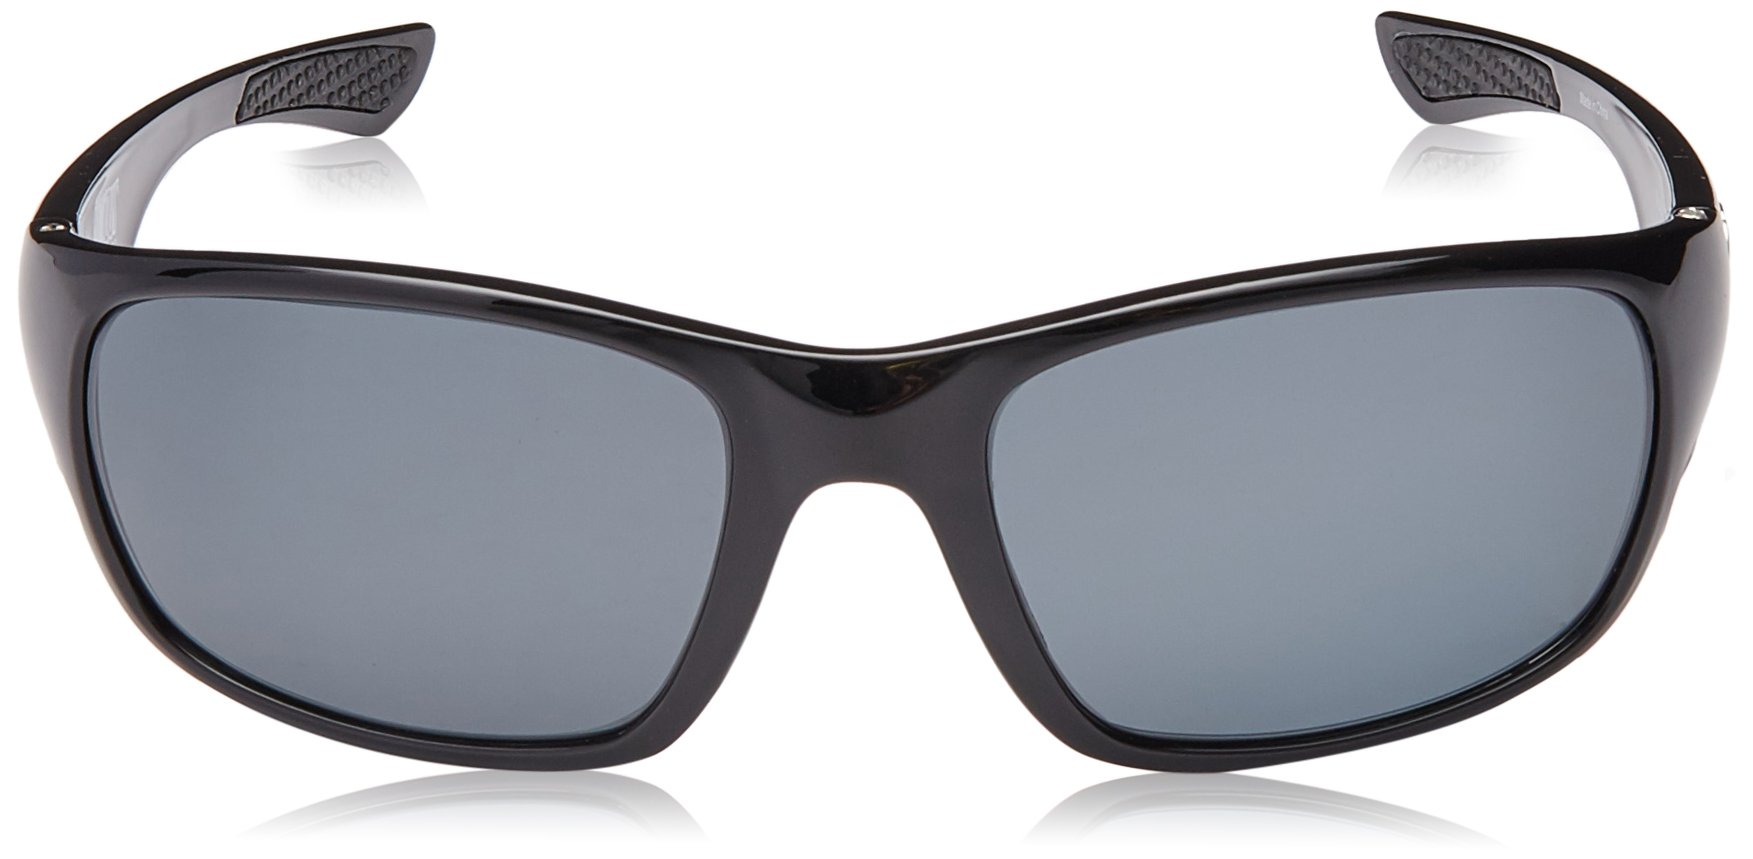 Vicious Vision Victory Series Sunglasses, Black by Vicious Vision (Image #2)